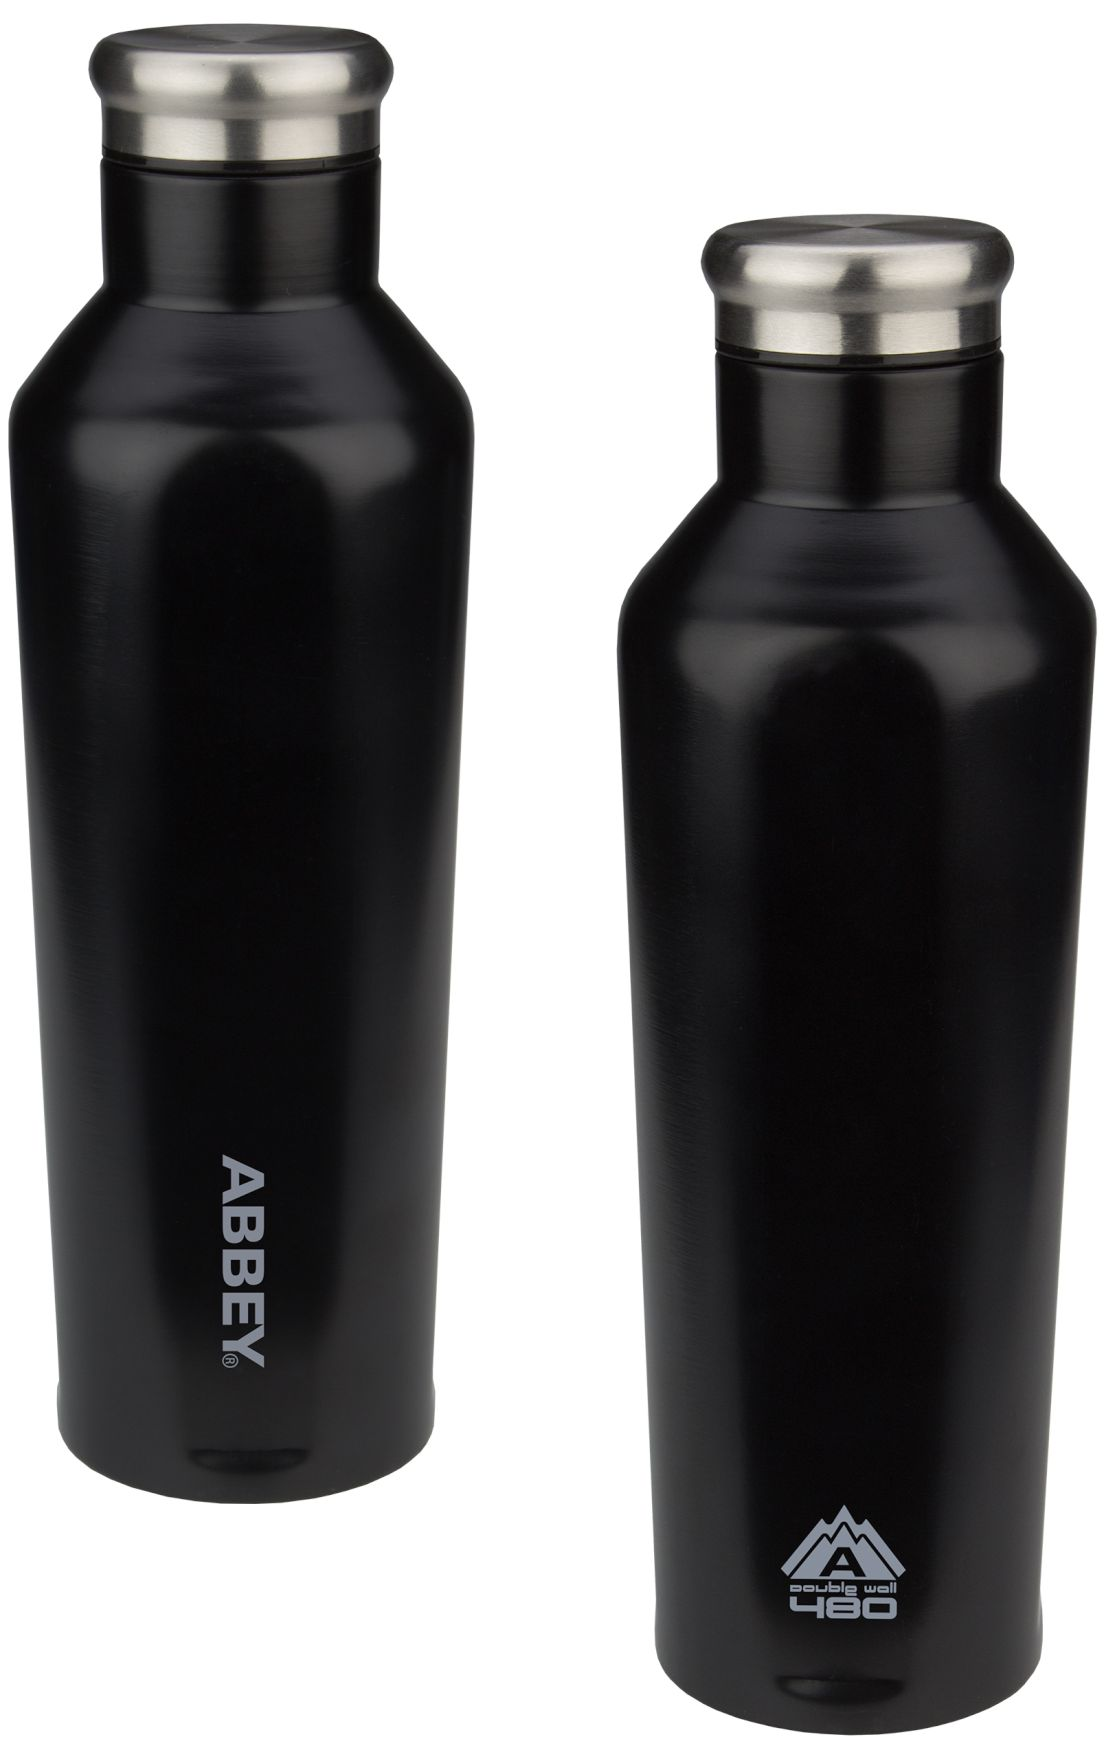 Drinkfles Dubbelwandig Godafoss • 0.48 Liter •